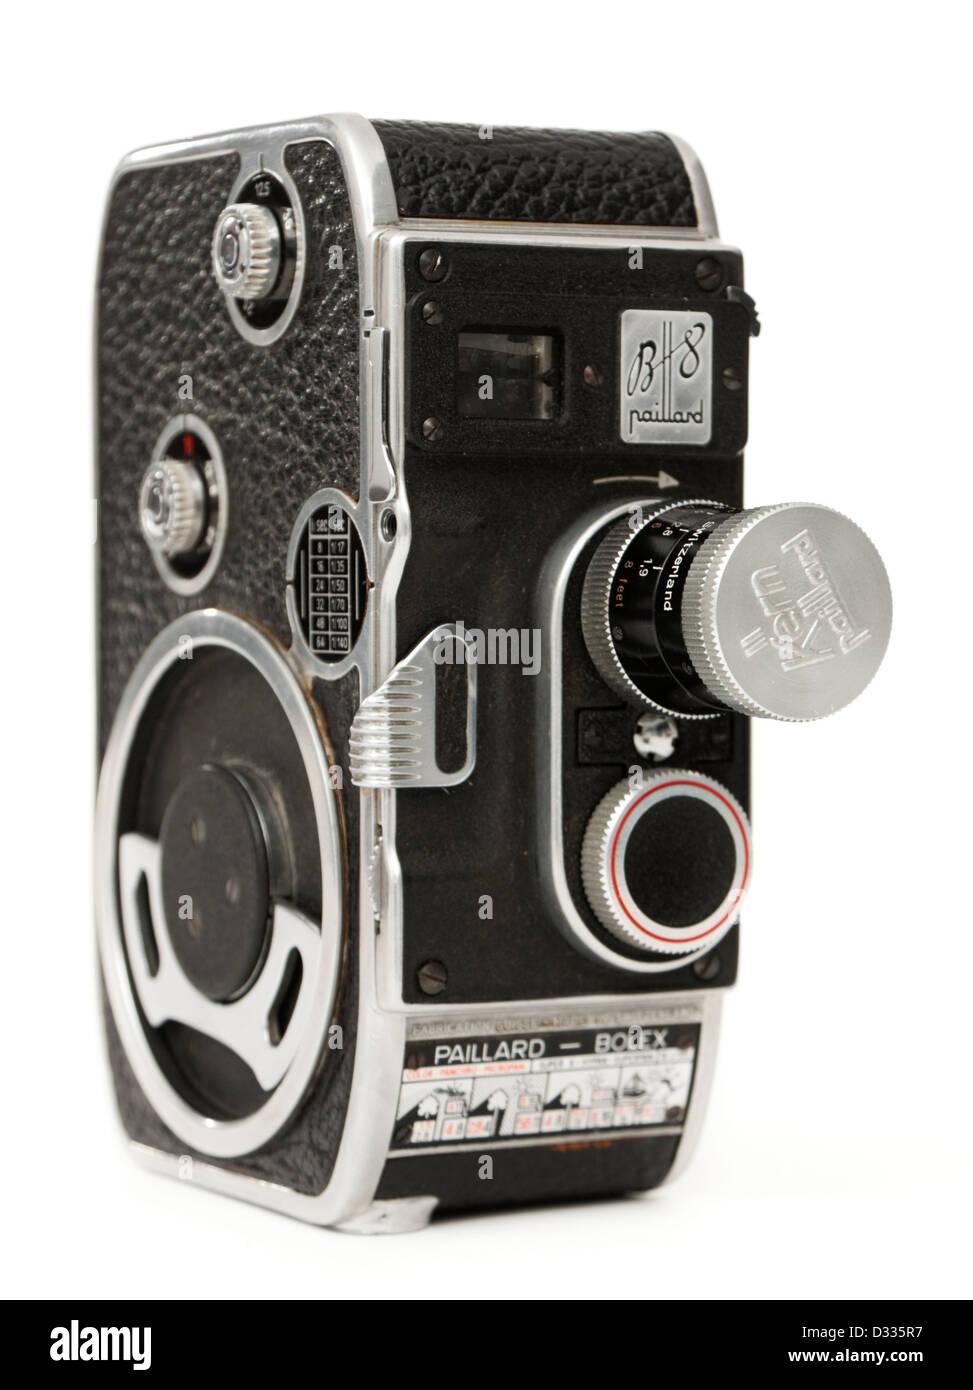 1955 1957 bolex paillard b8 cine movie film camera double 8mm stock photo royalty free image. Black Bedroom Furniture Sets. Home Design Ideas